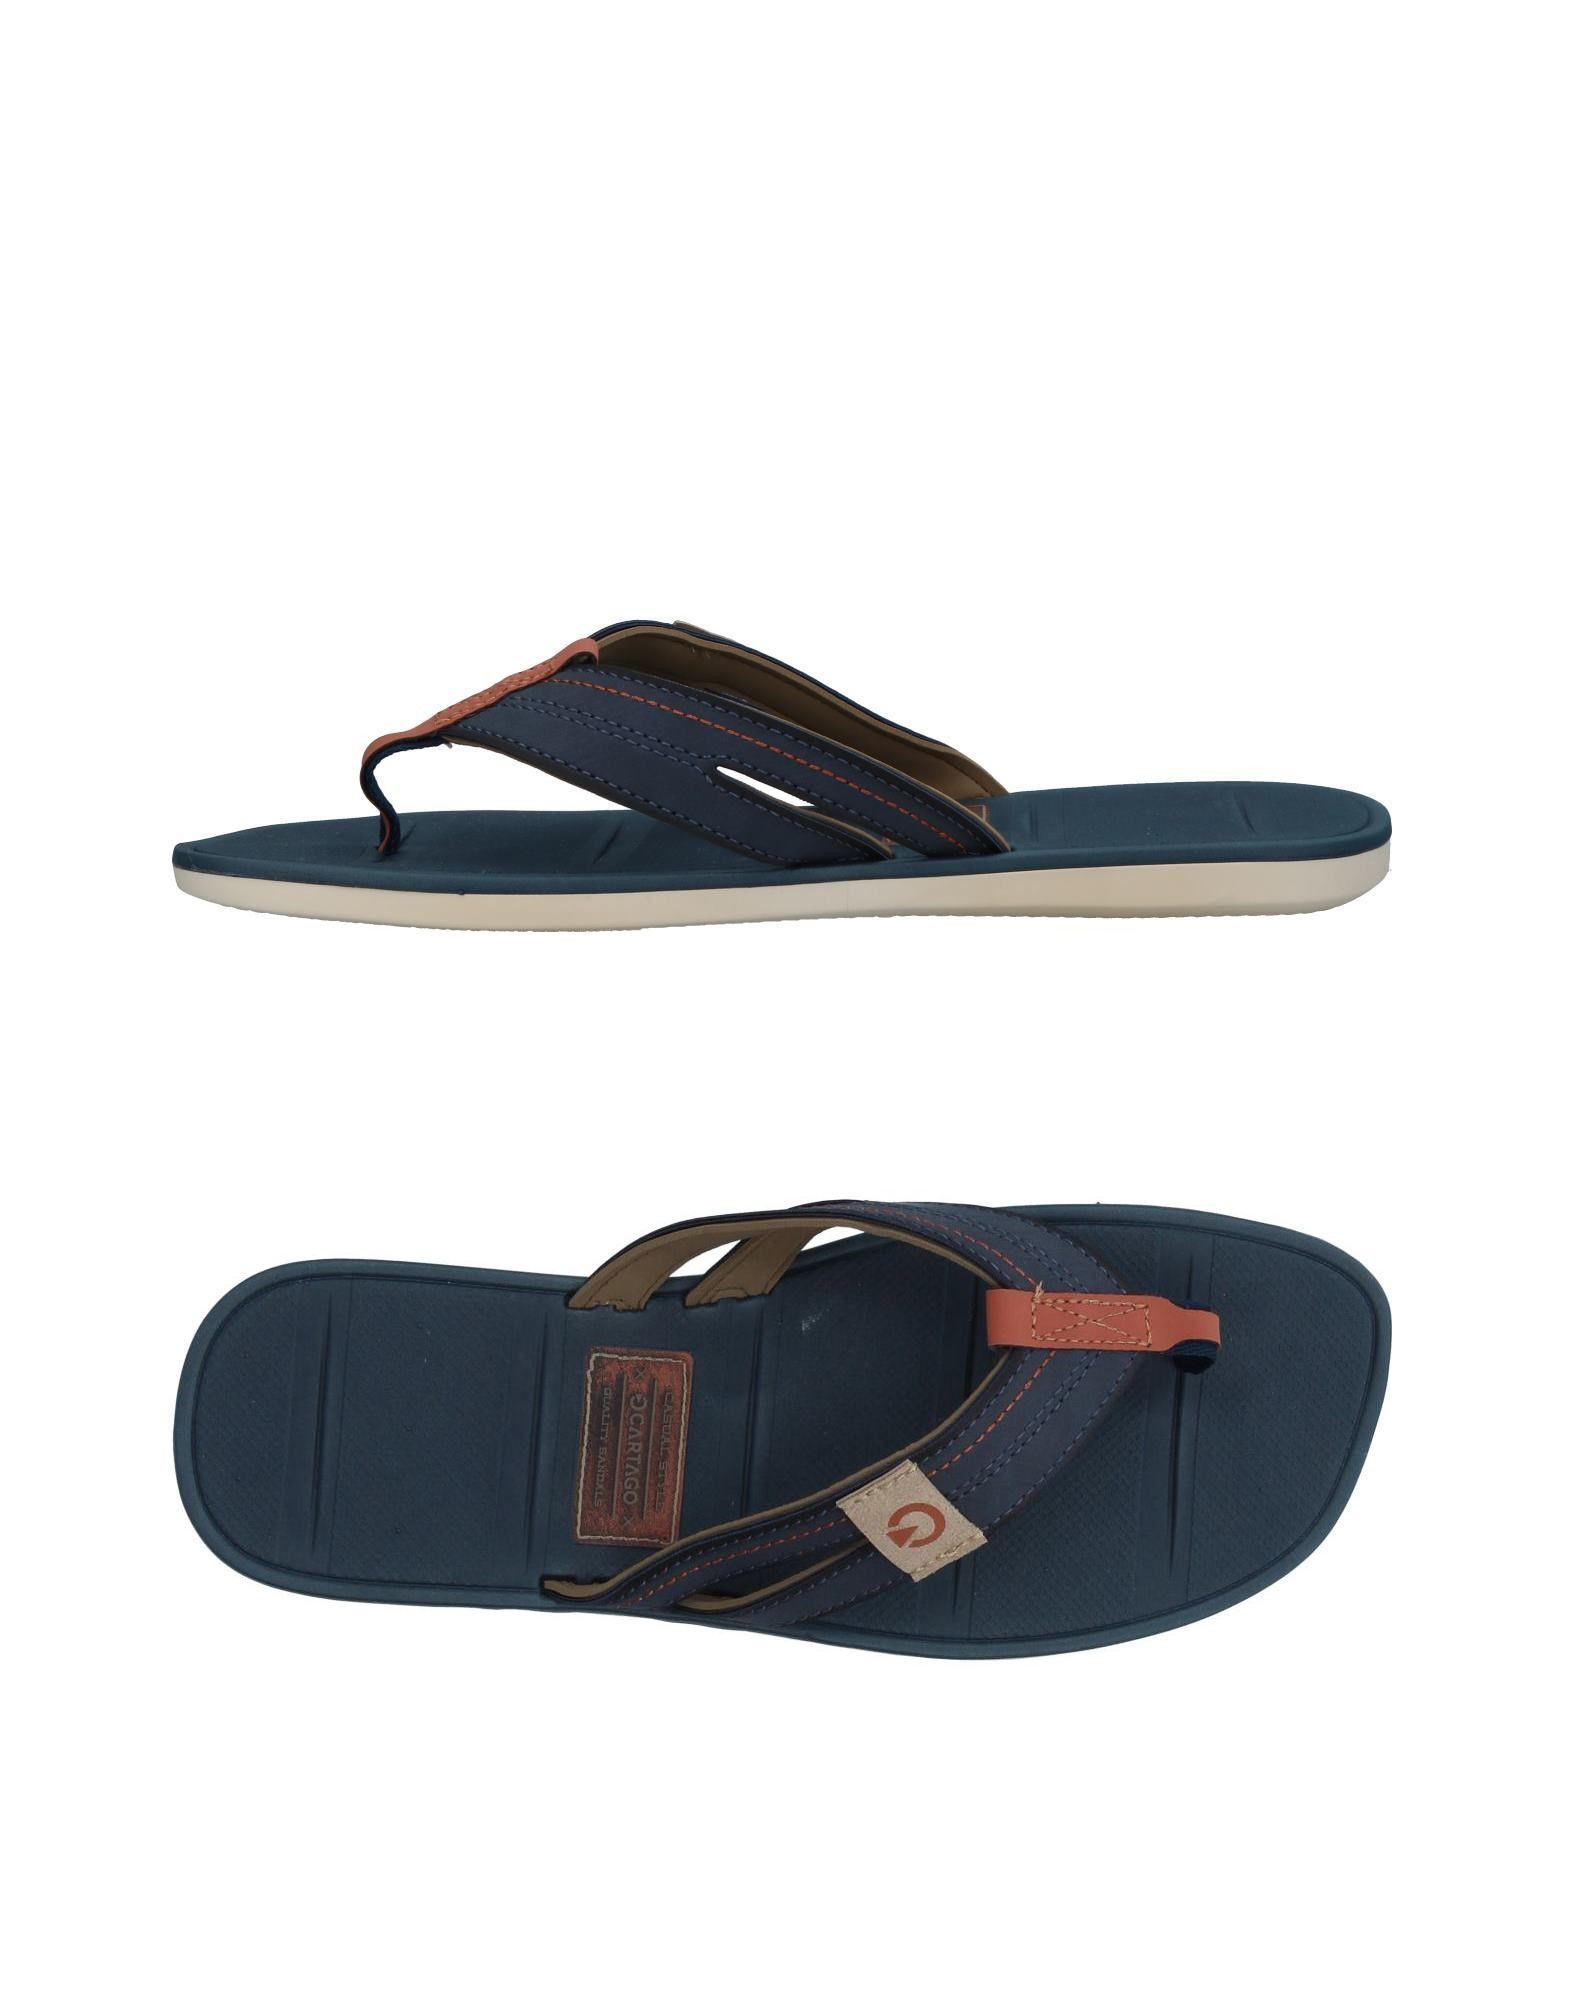 3dd4b8825eb4d Cartago Men Flip Flops on YOOX. The best online selection of Flip Flops  Cartago. YOOX exclusive items of Italian and international designers -  Secure ...